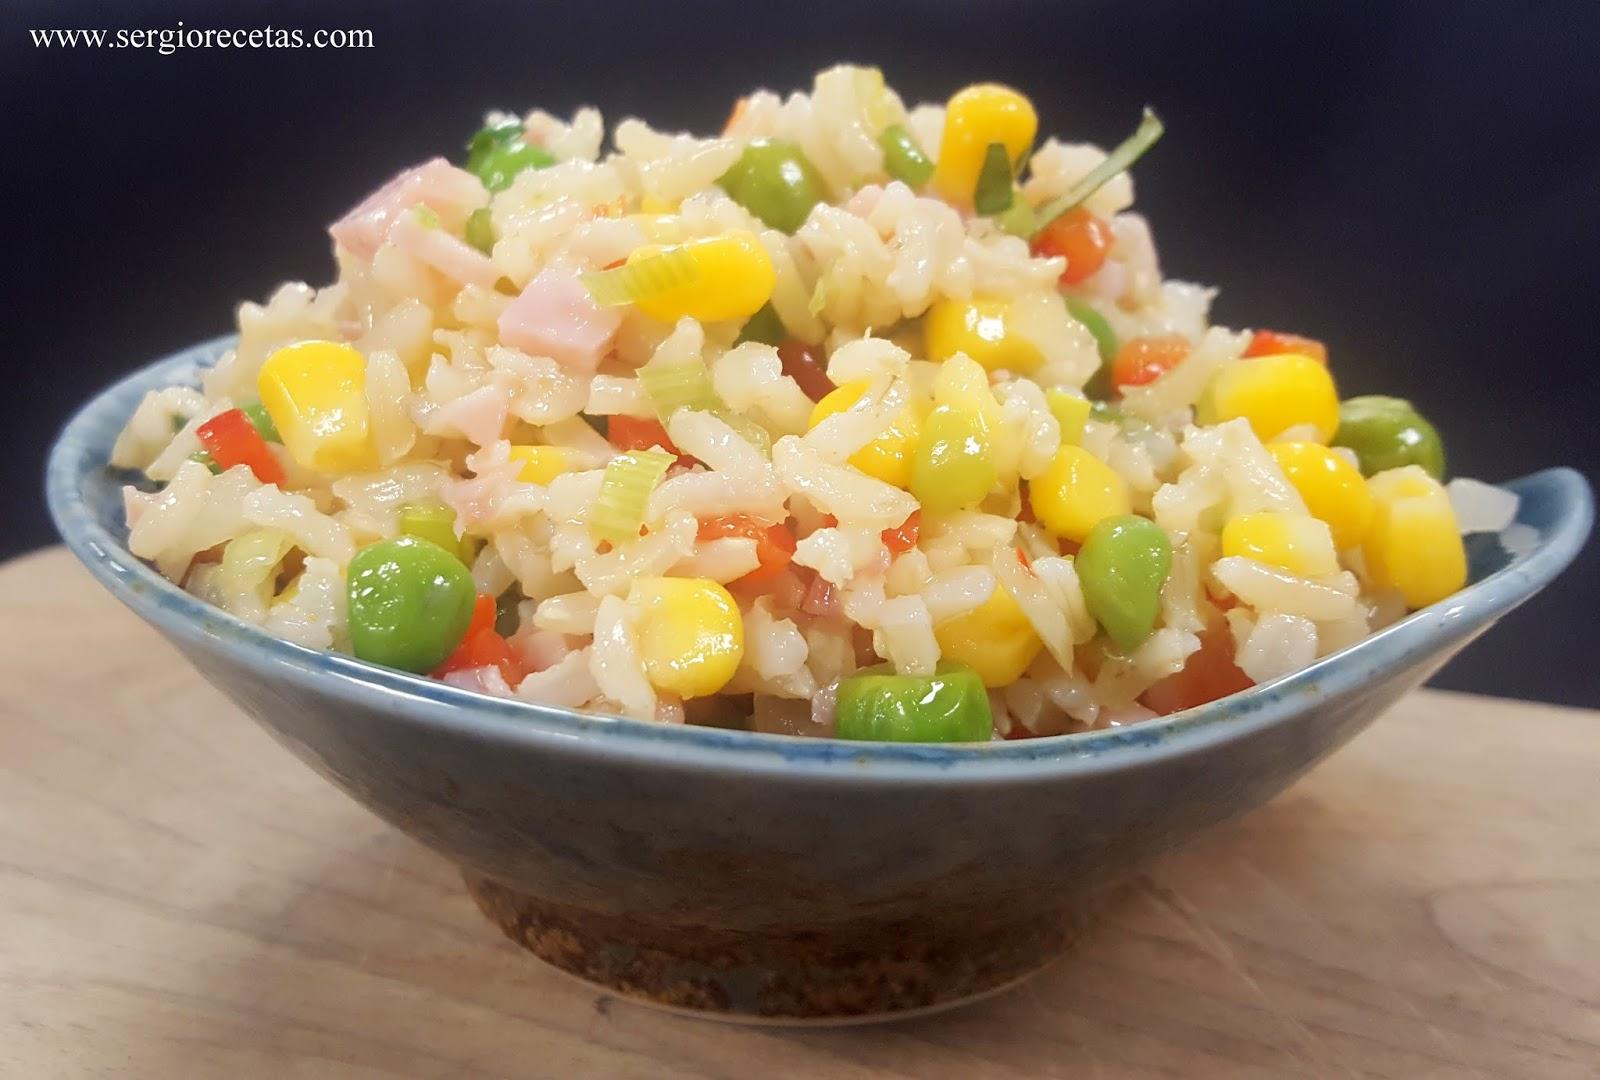 Realfood ensalada de arroz integral - Ensalada de arroz light ...